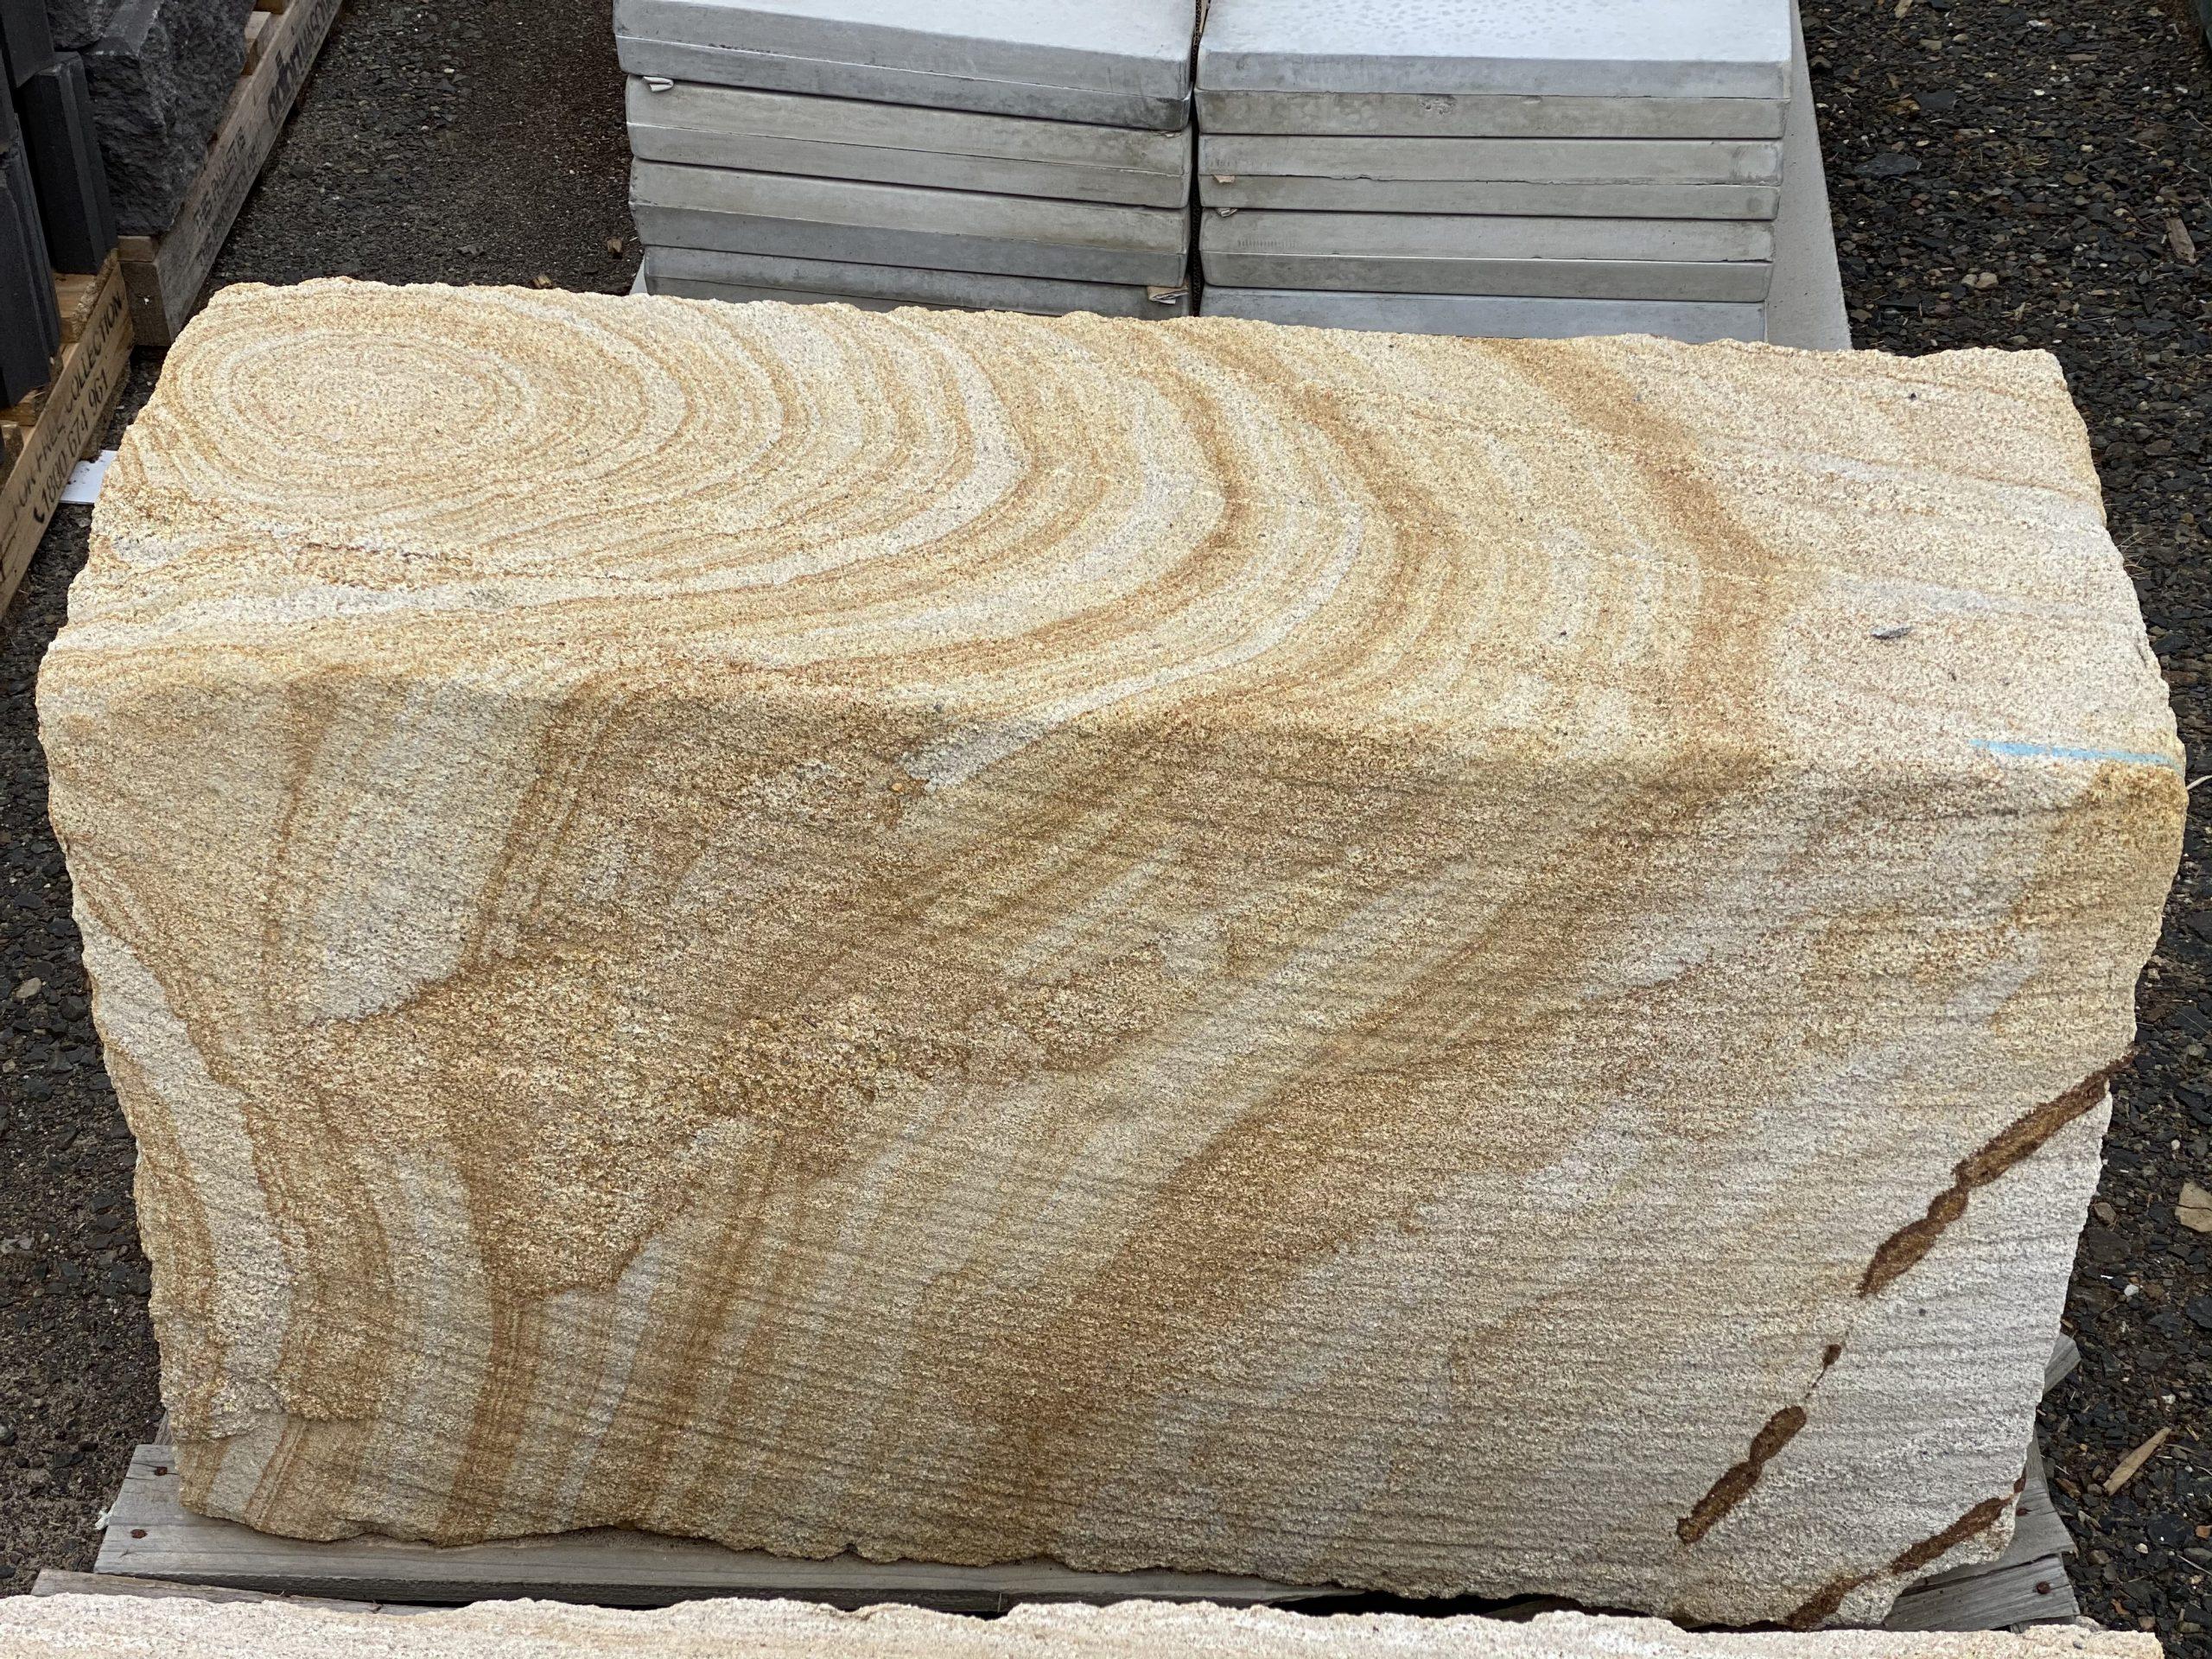 SandStone-Blocks-Image-7